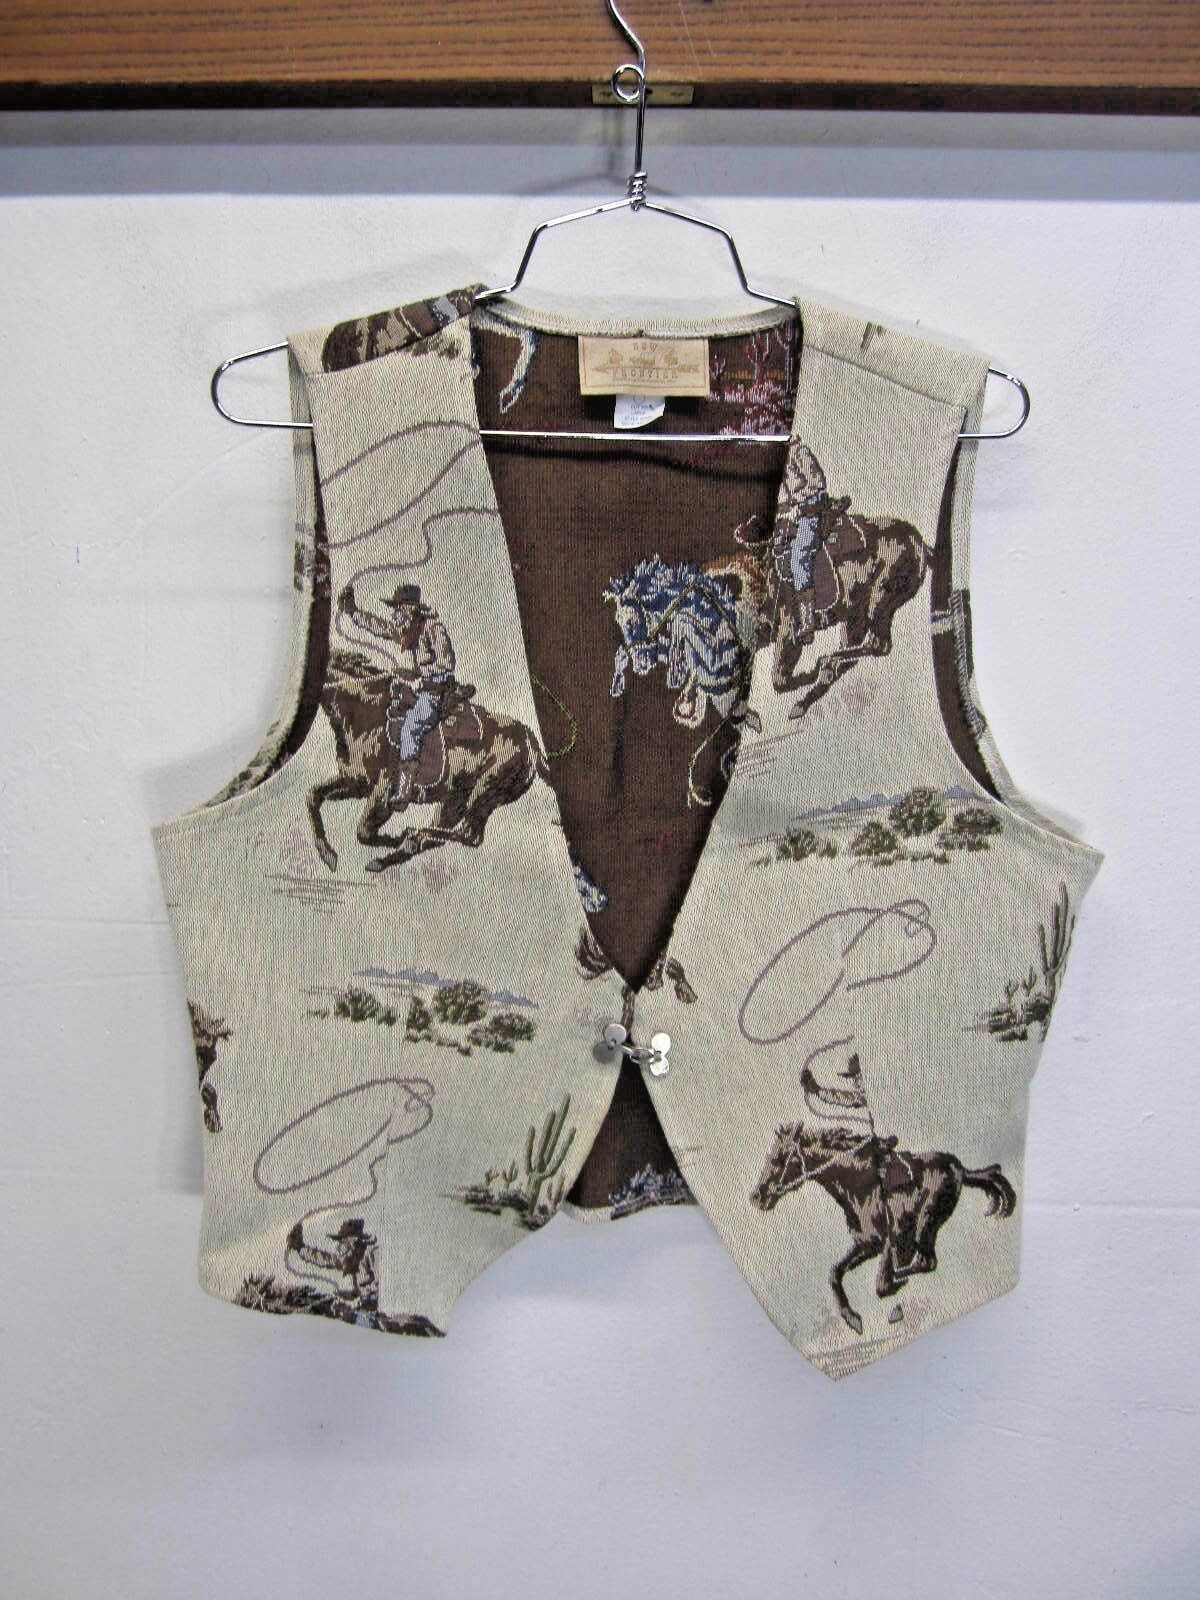 EUC  New Frontier Western Art Vest Cowboy print polycotton sz L made in USA